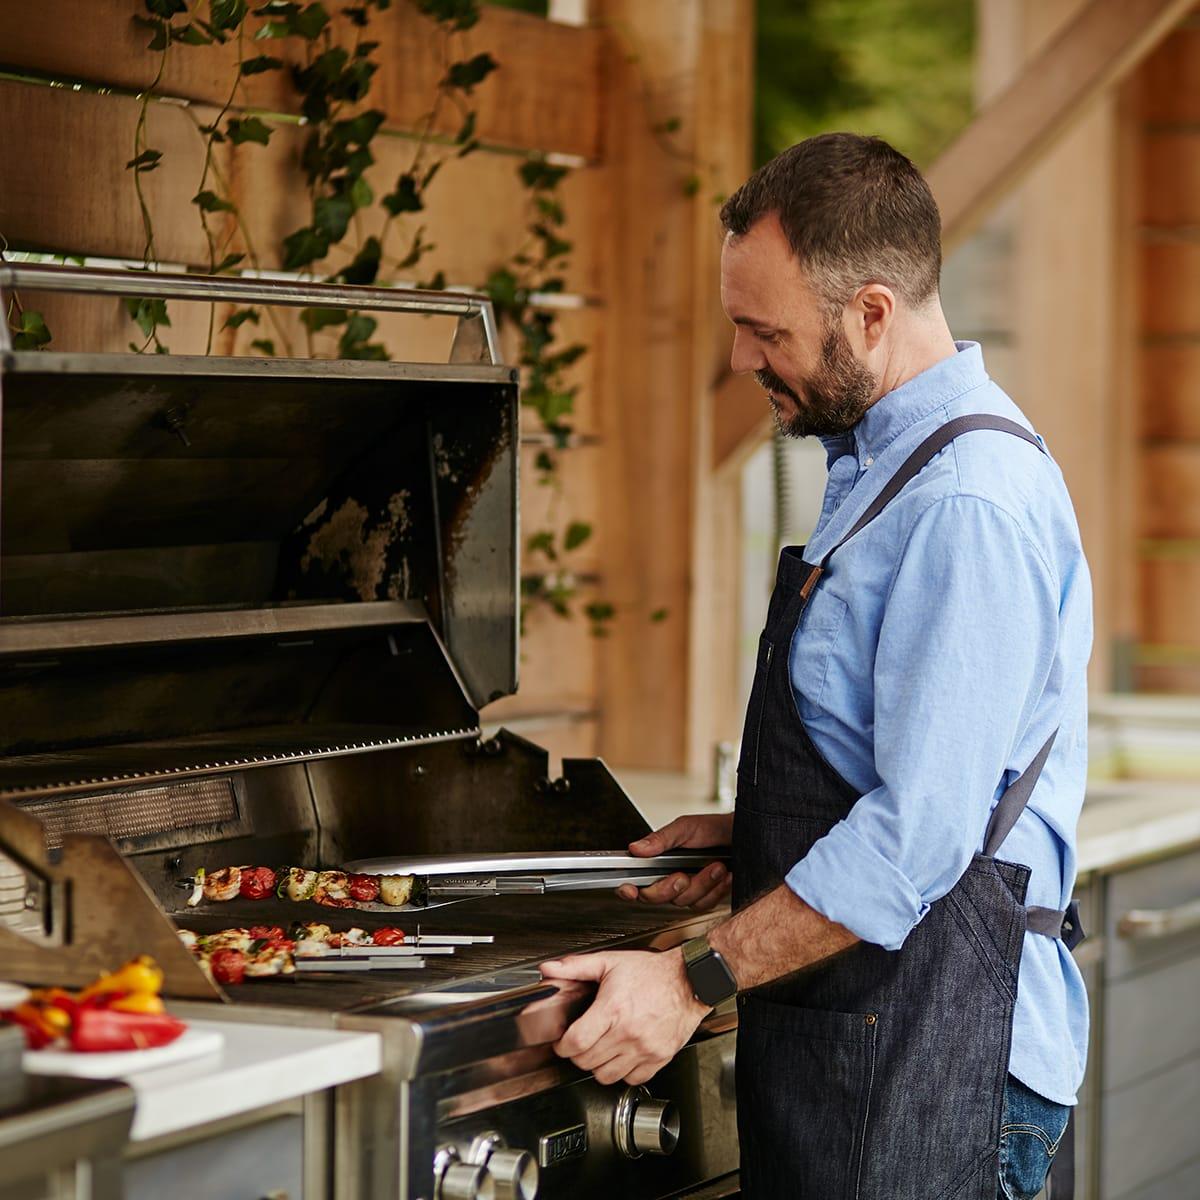 Cuisinart Sliding Skewers - grill